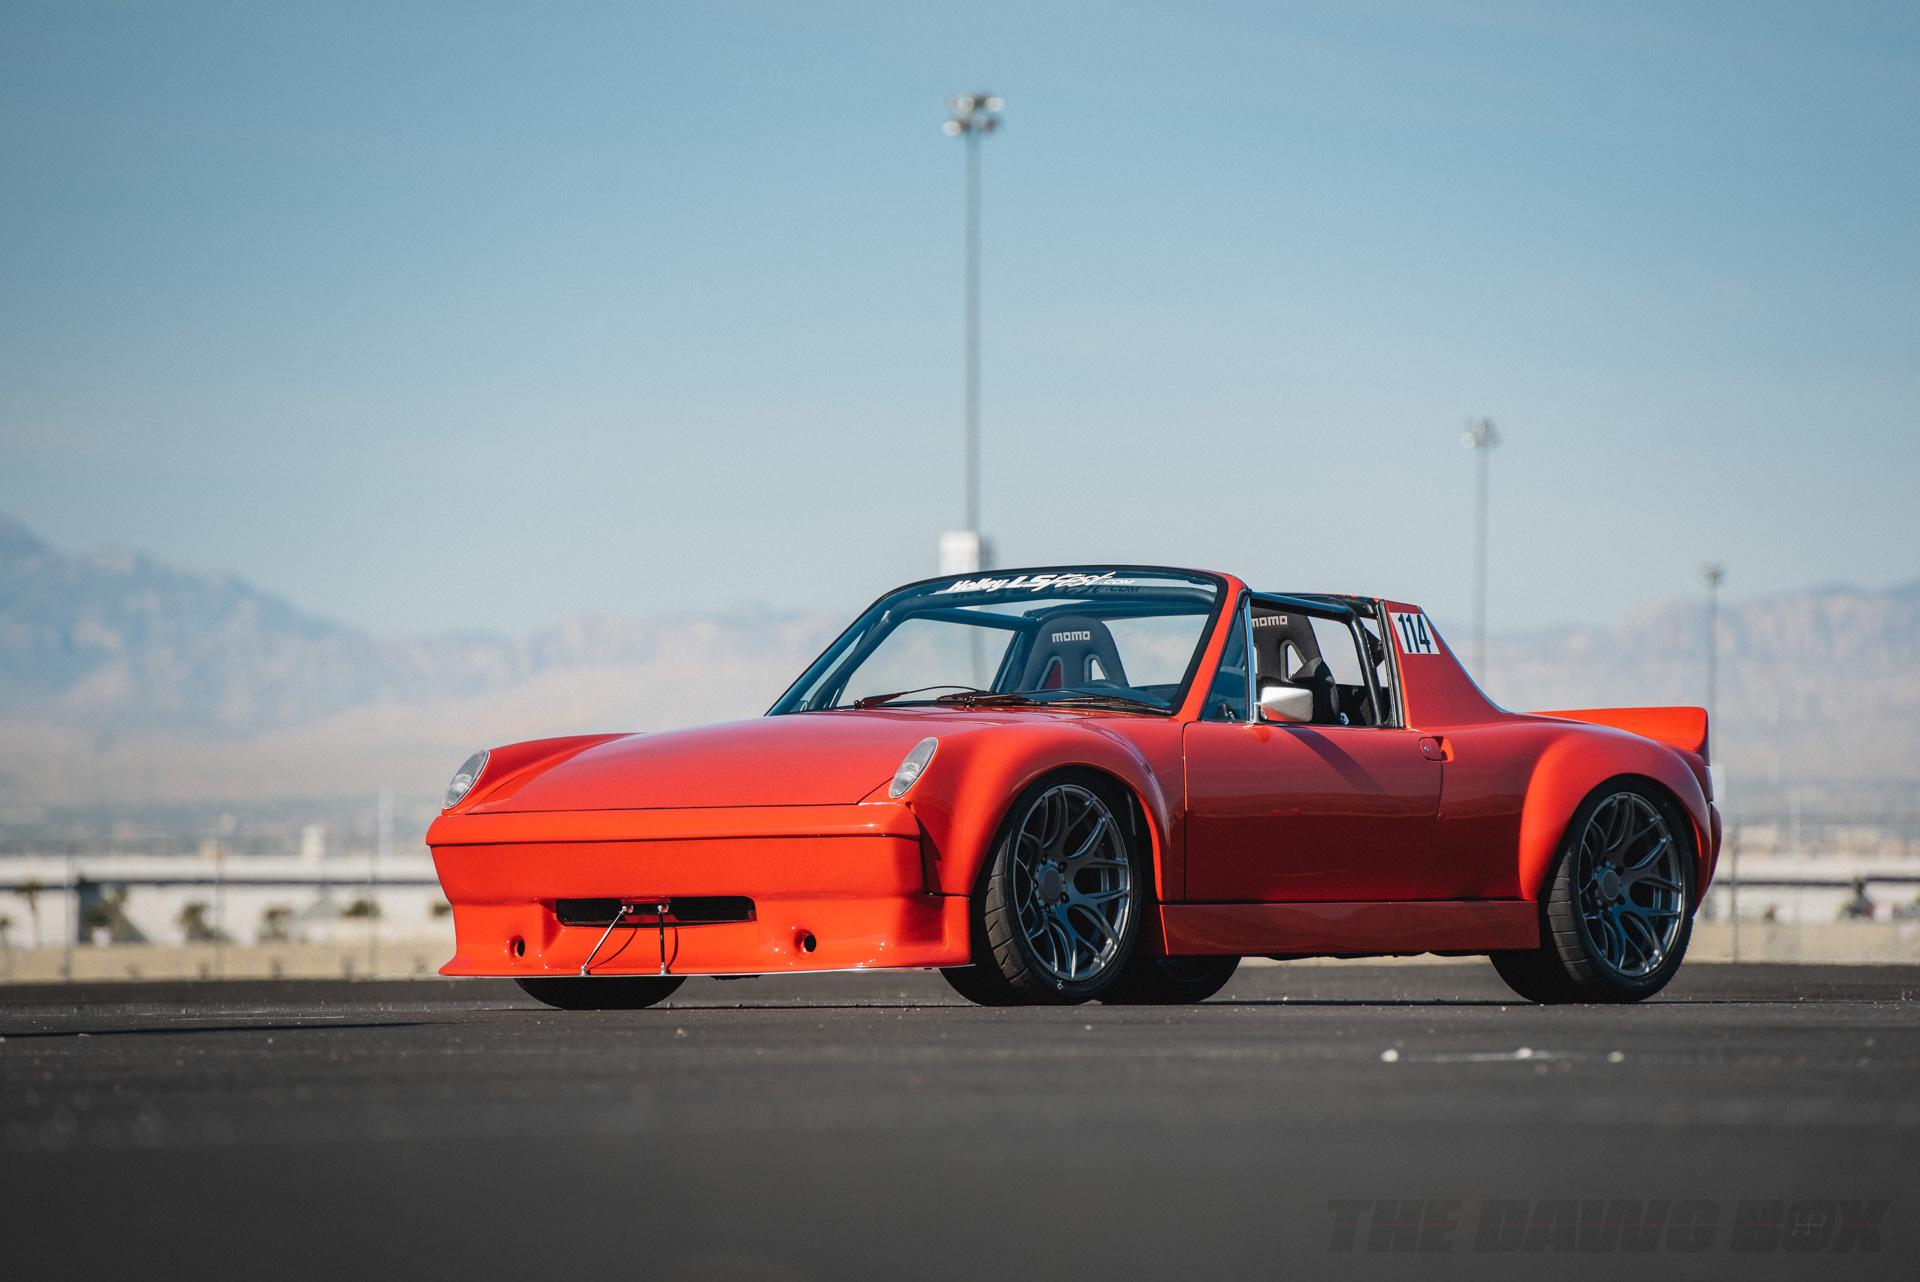 Orange LS swapped sports car